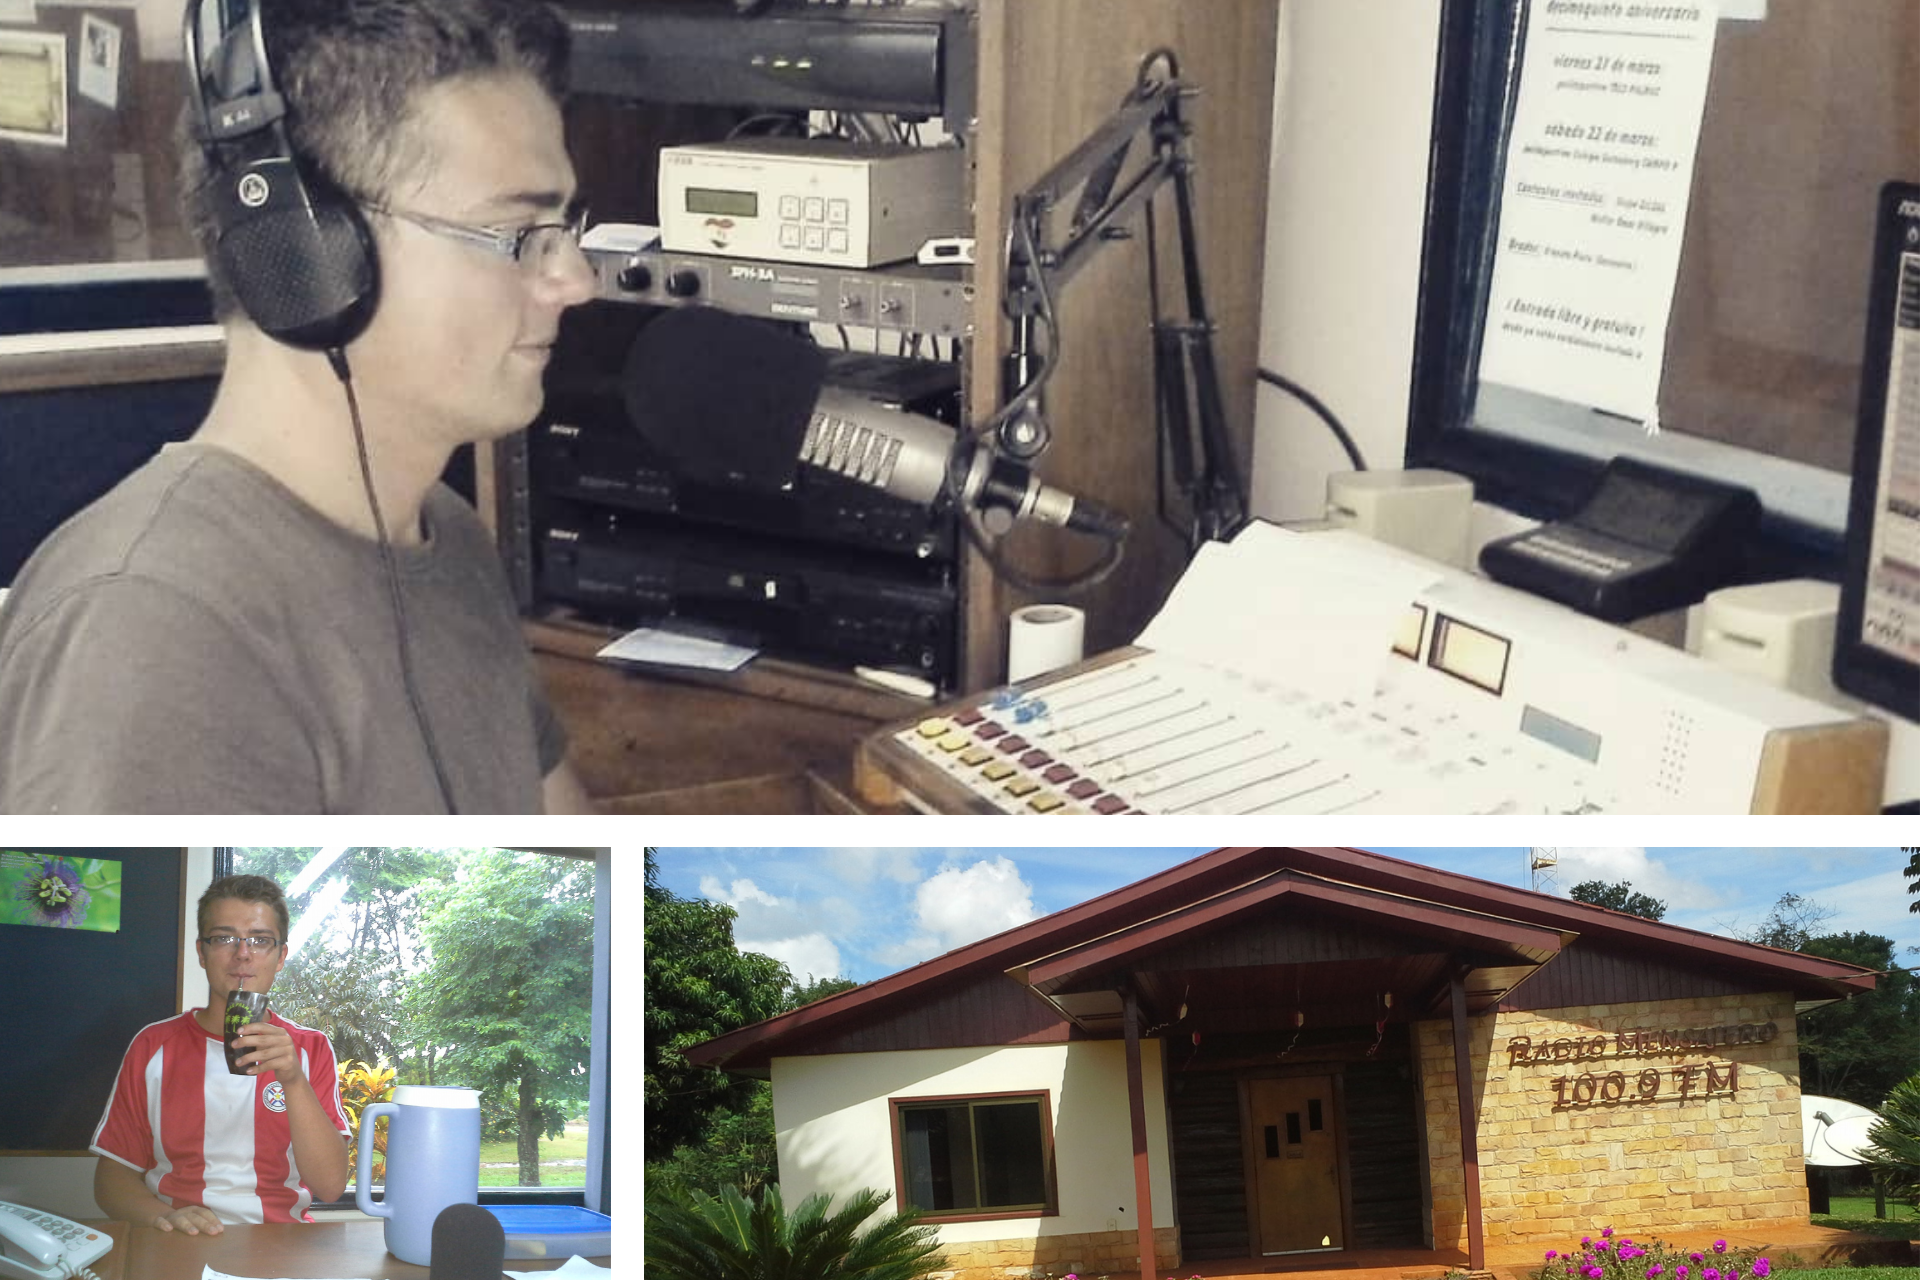 Paraguay Religion Radio Mission Mennoniten